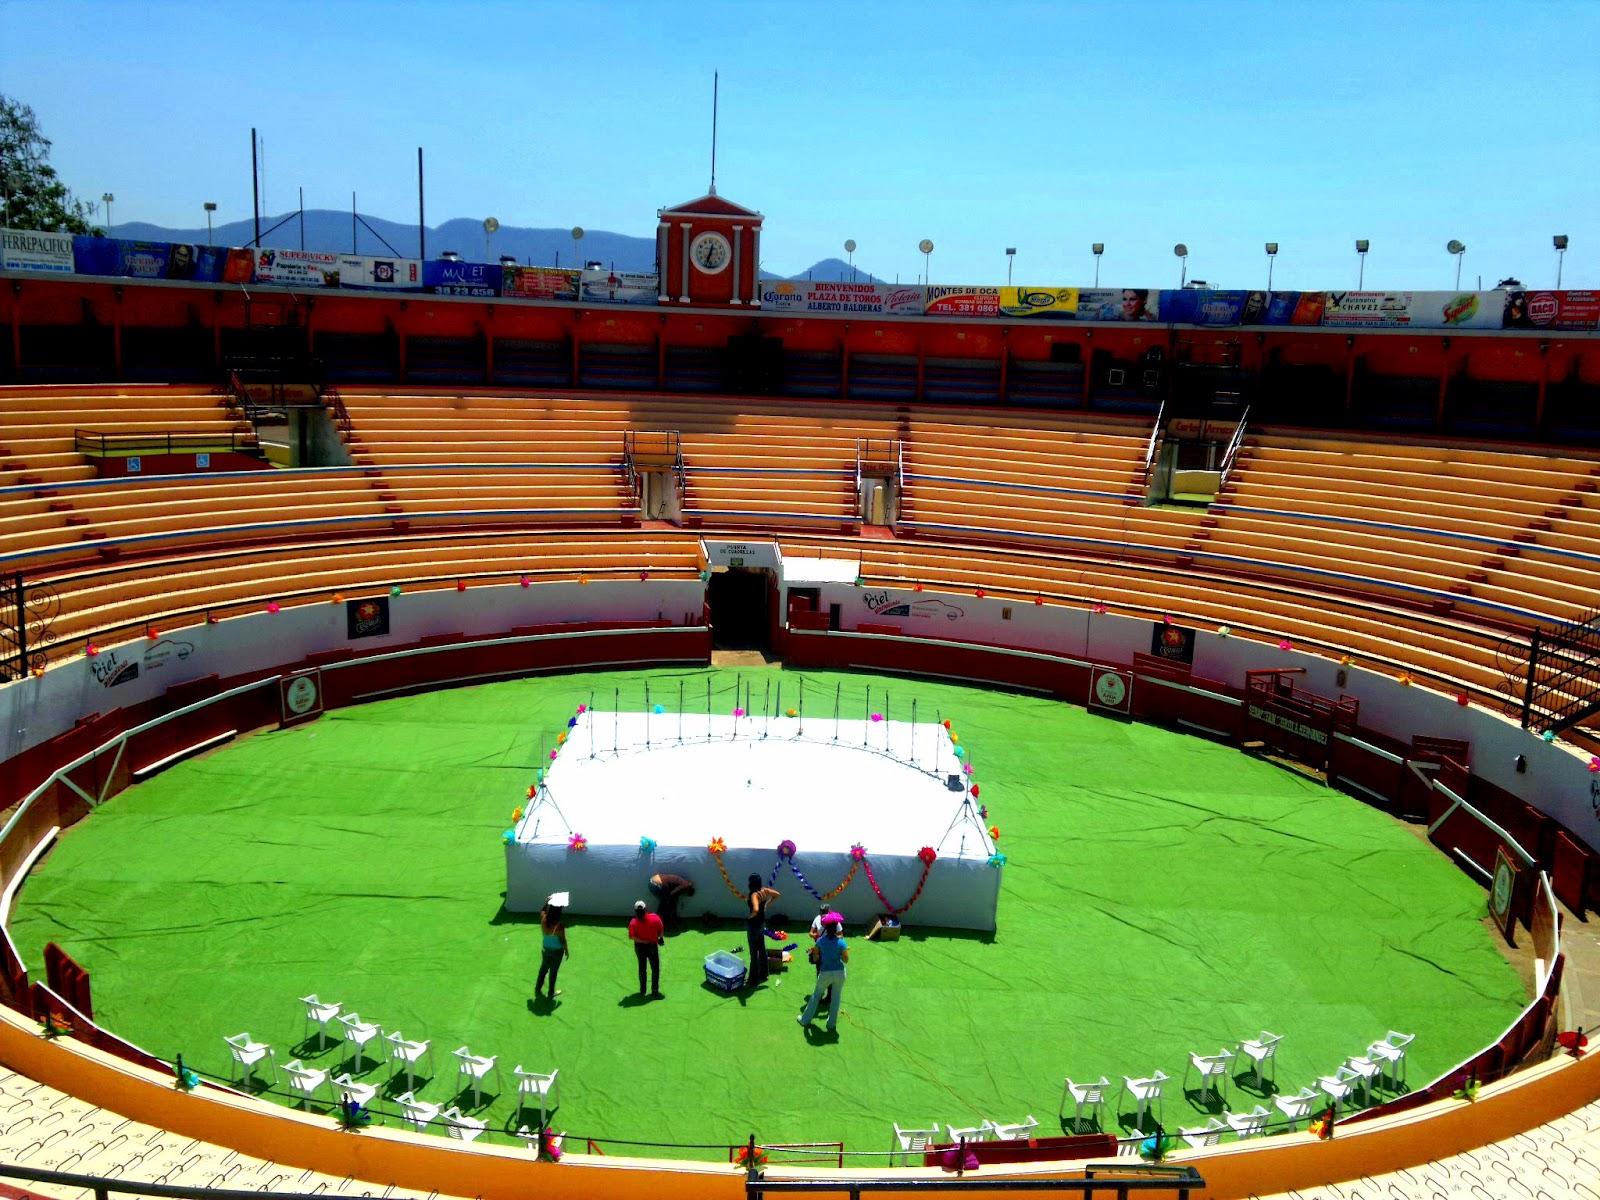 La monumental Plaza de Toros Alberto Balderas | Uta! vale quien dijo?